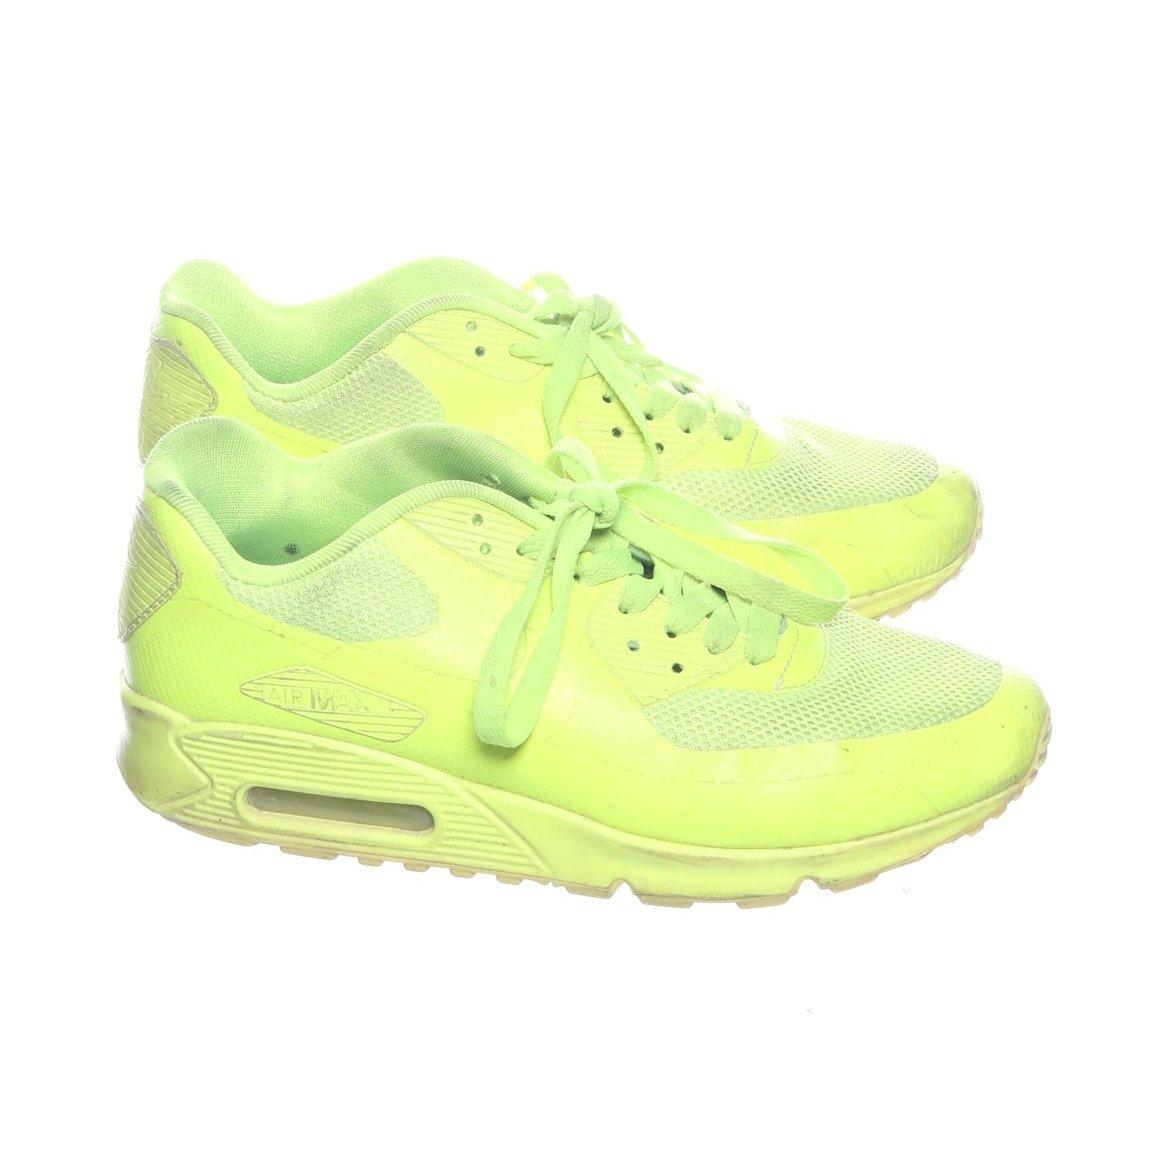 low priced 2a7f7 7dd2d Nike, Sneakers, Strl  40, Air Max 90 Hyperfuse Volt, Grön